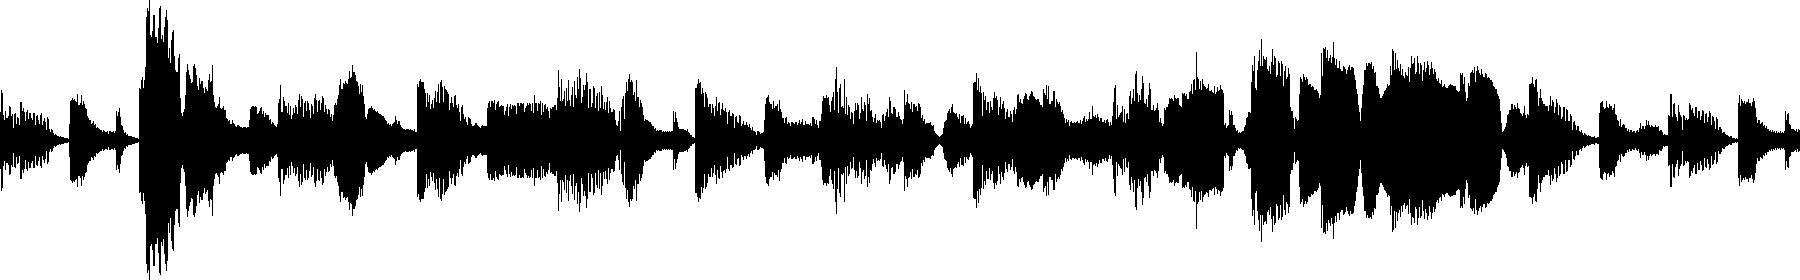 2 am 126 demo sax loop raul romo